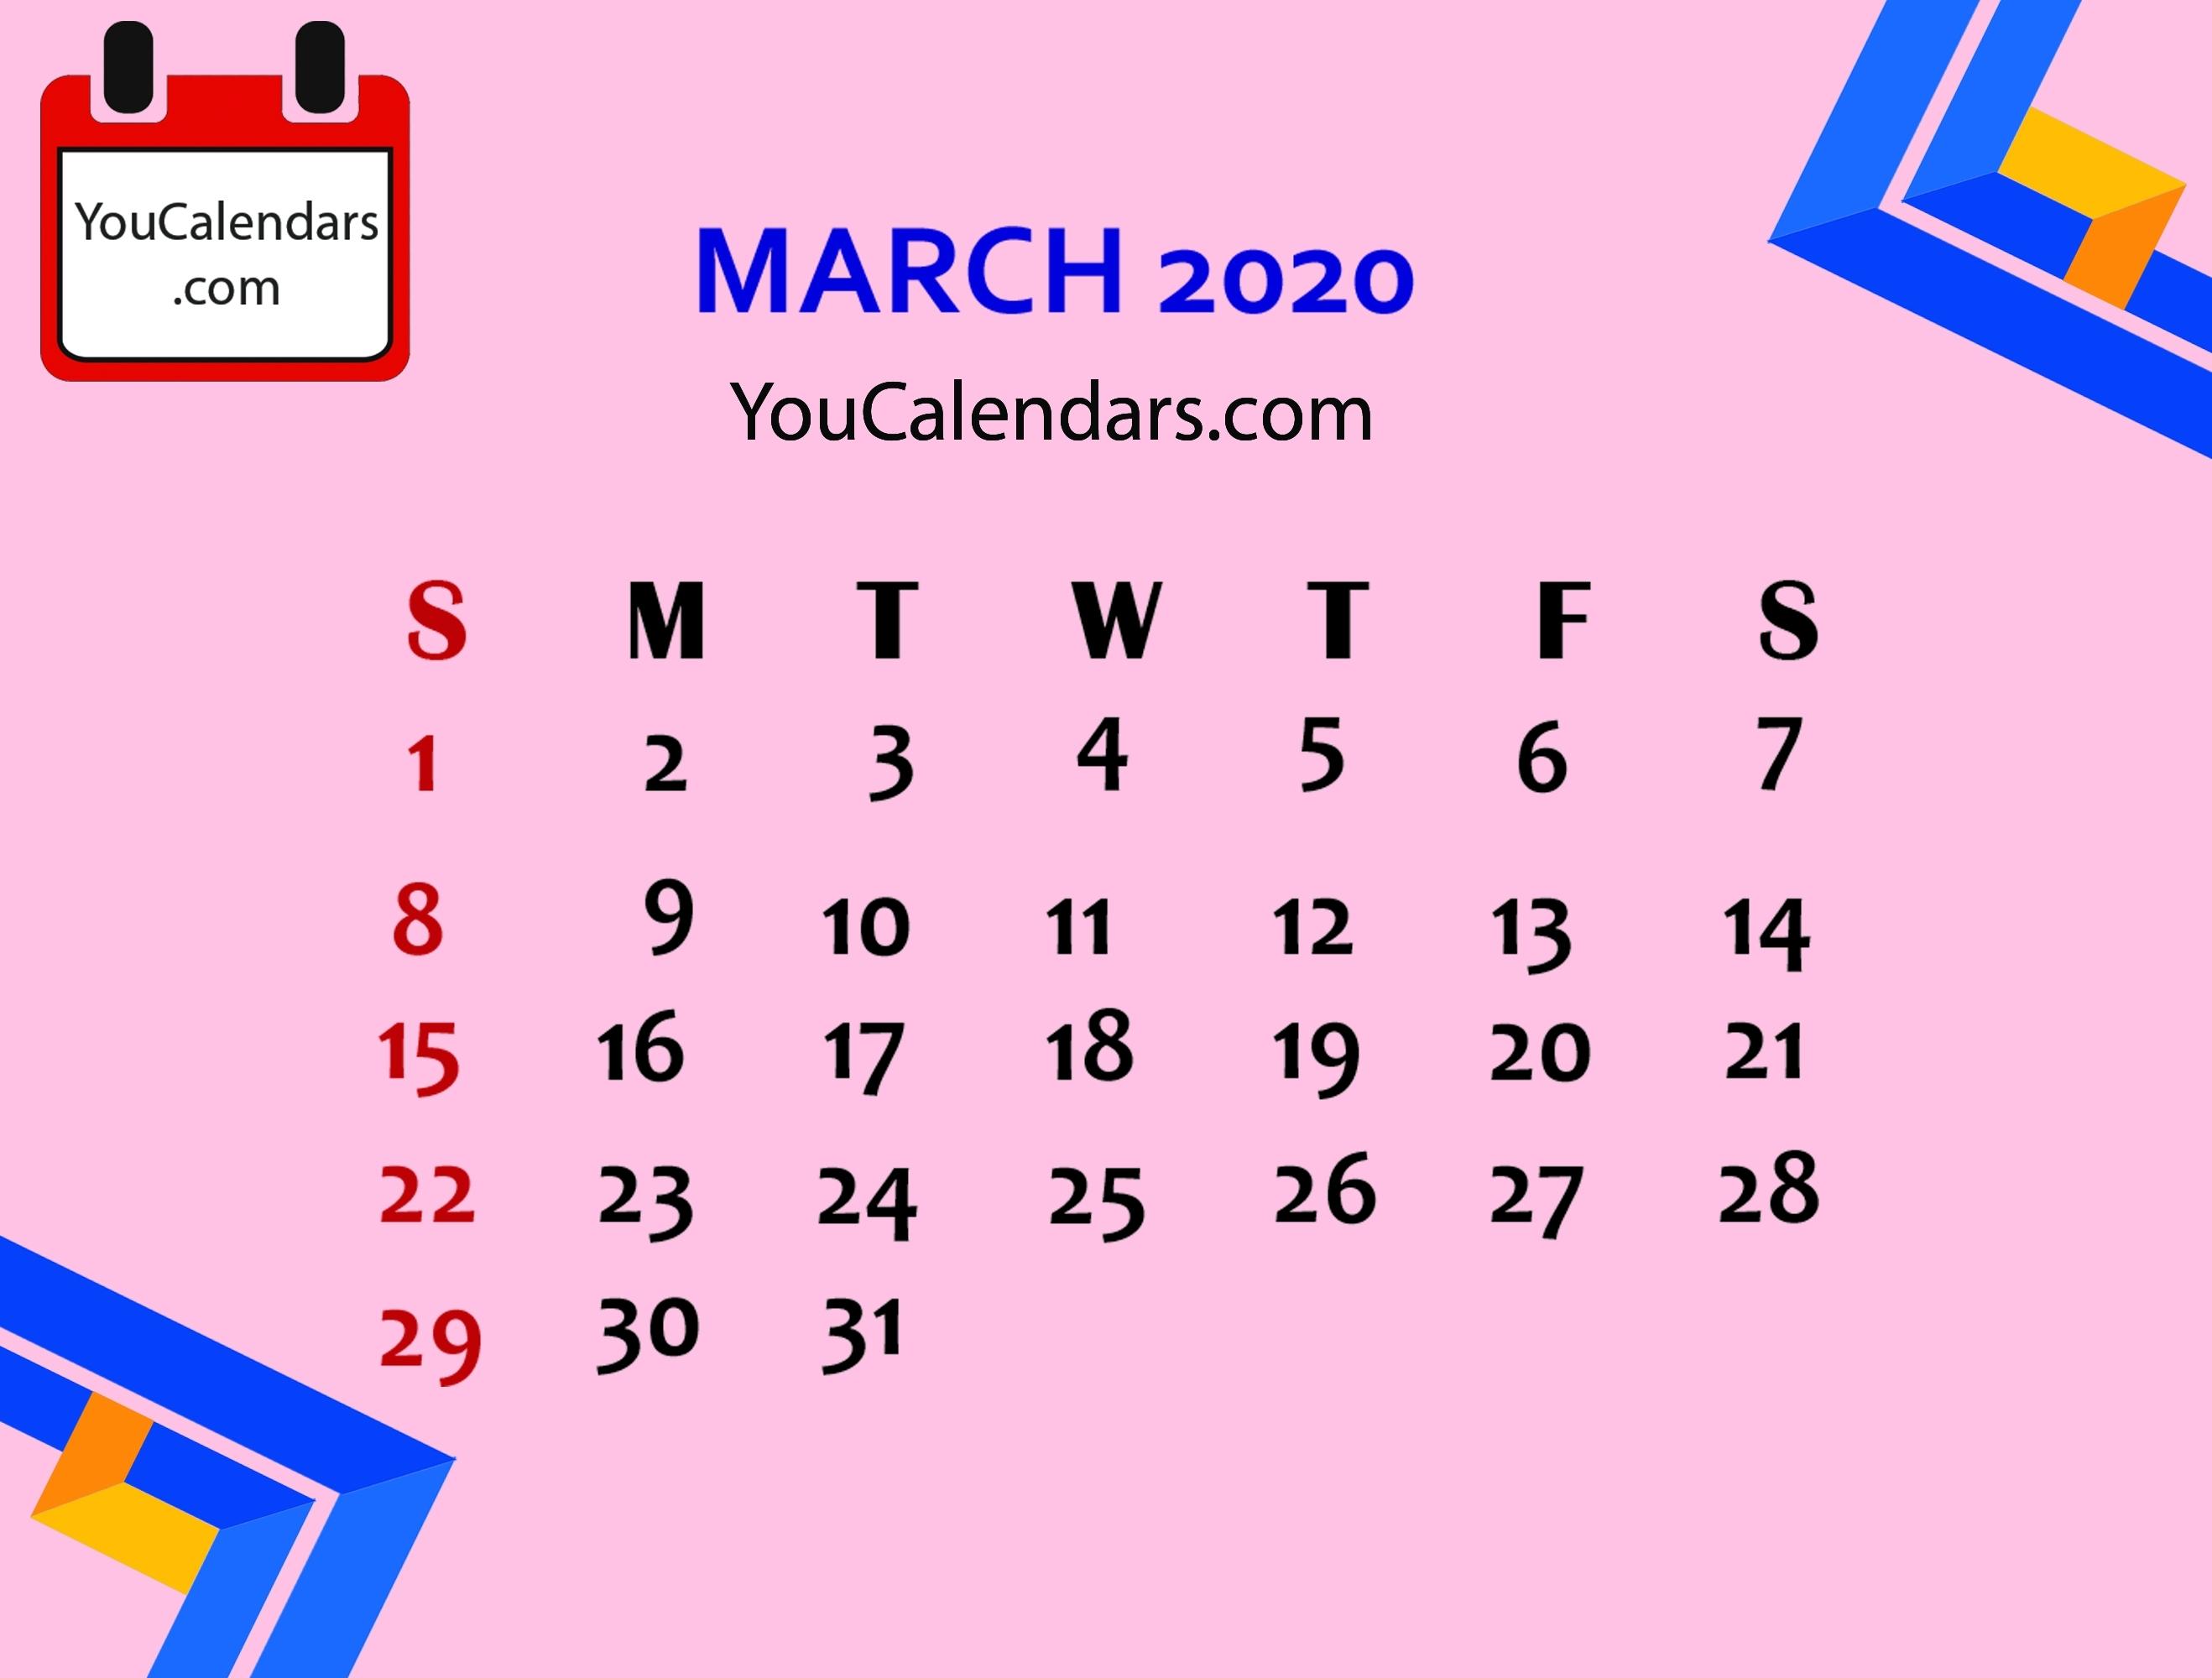 ✅Free March 2020 Calendar Printable Template - You Calendars